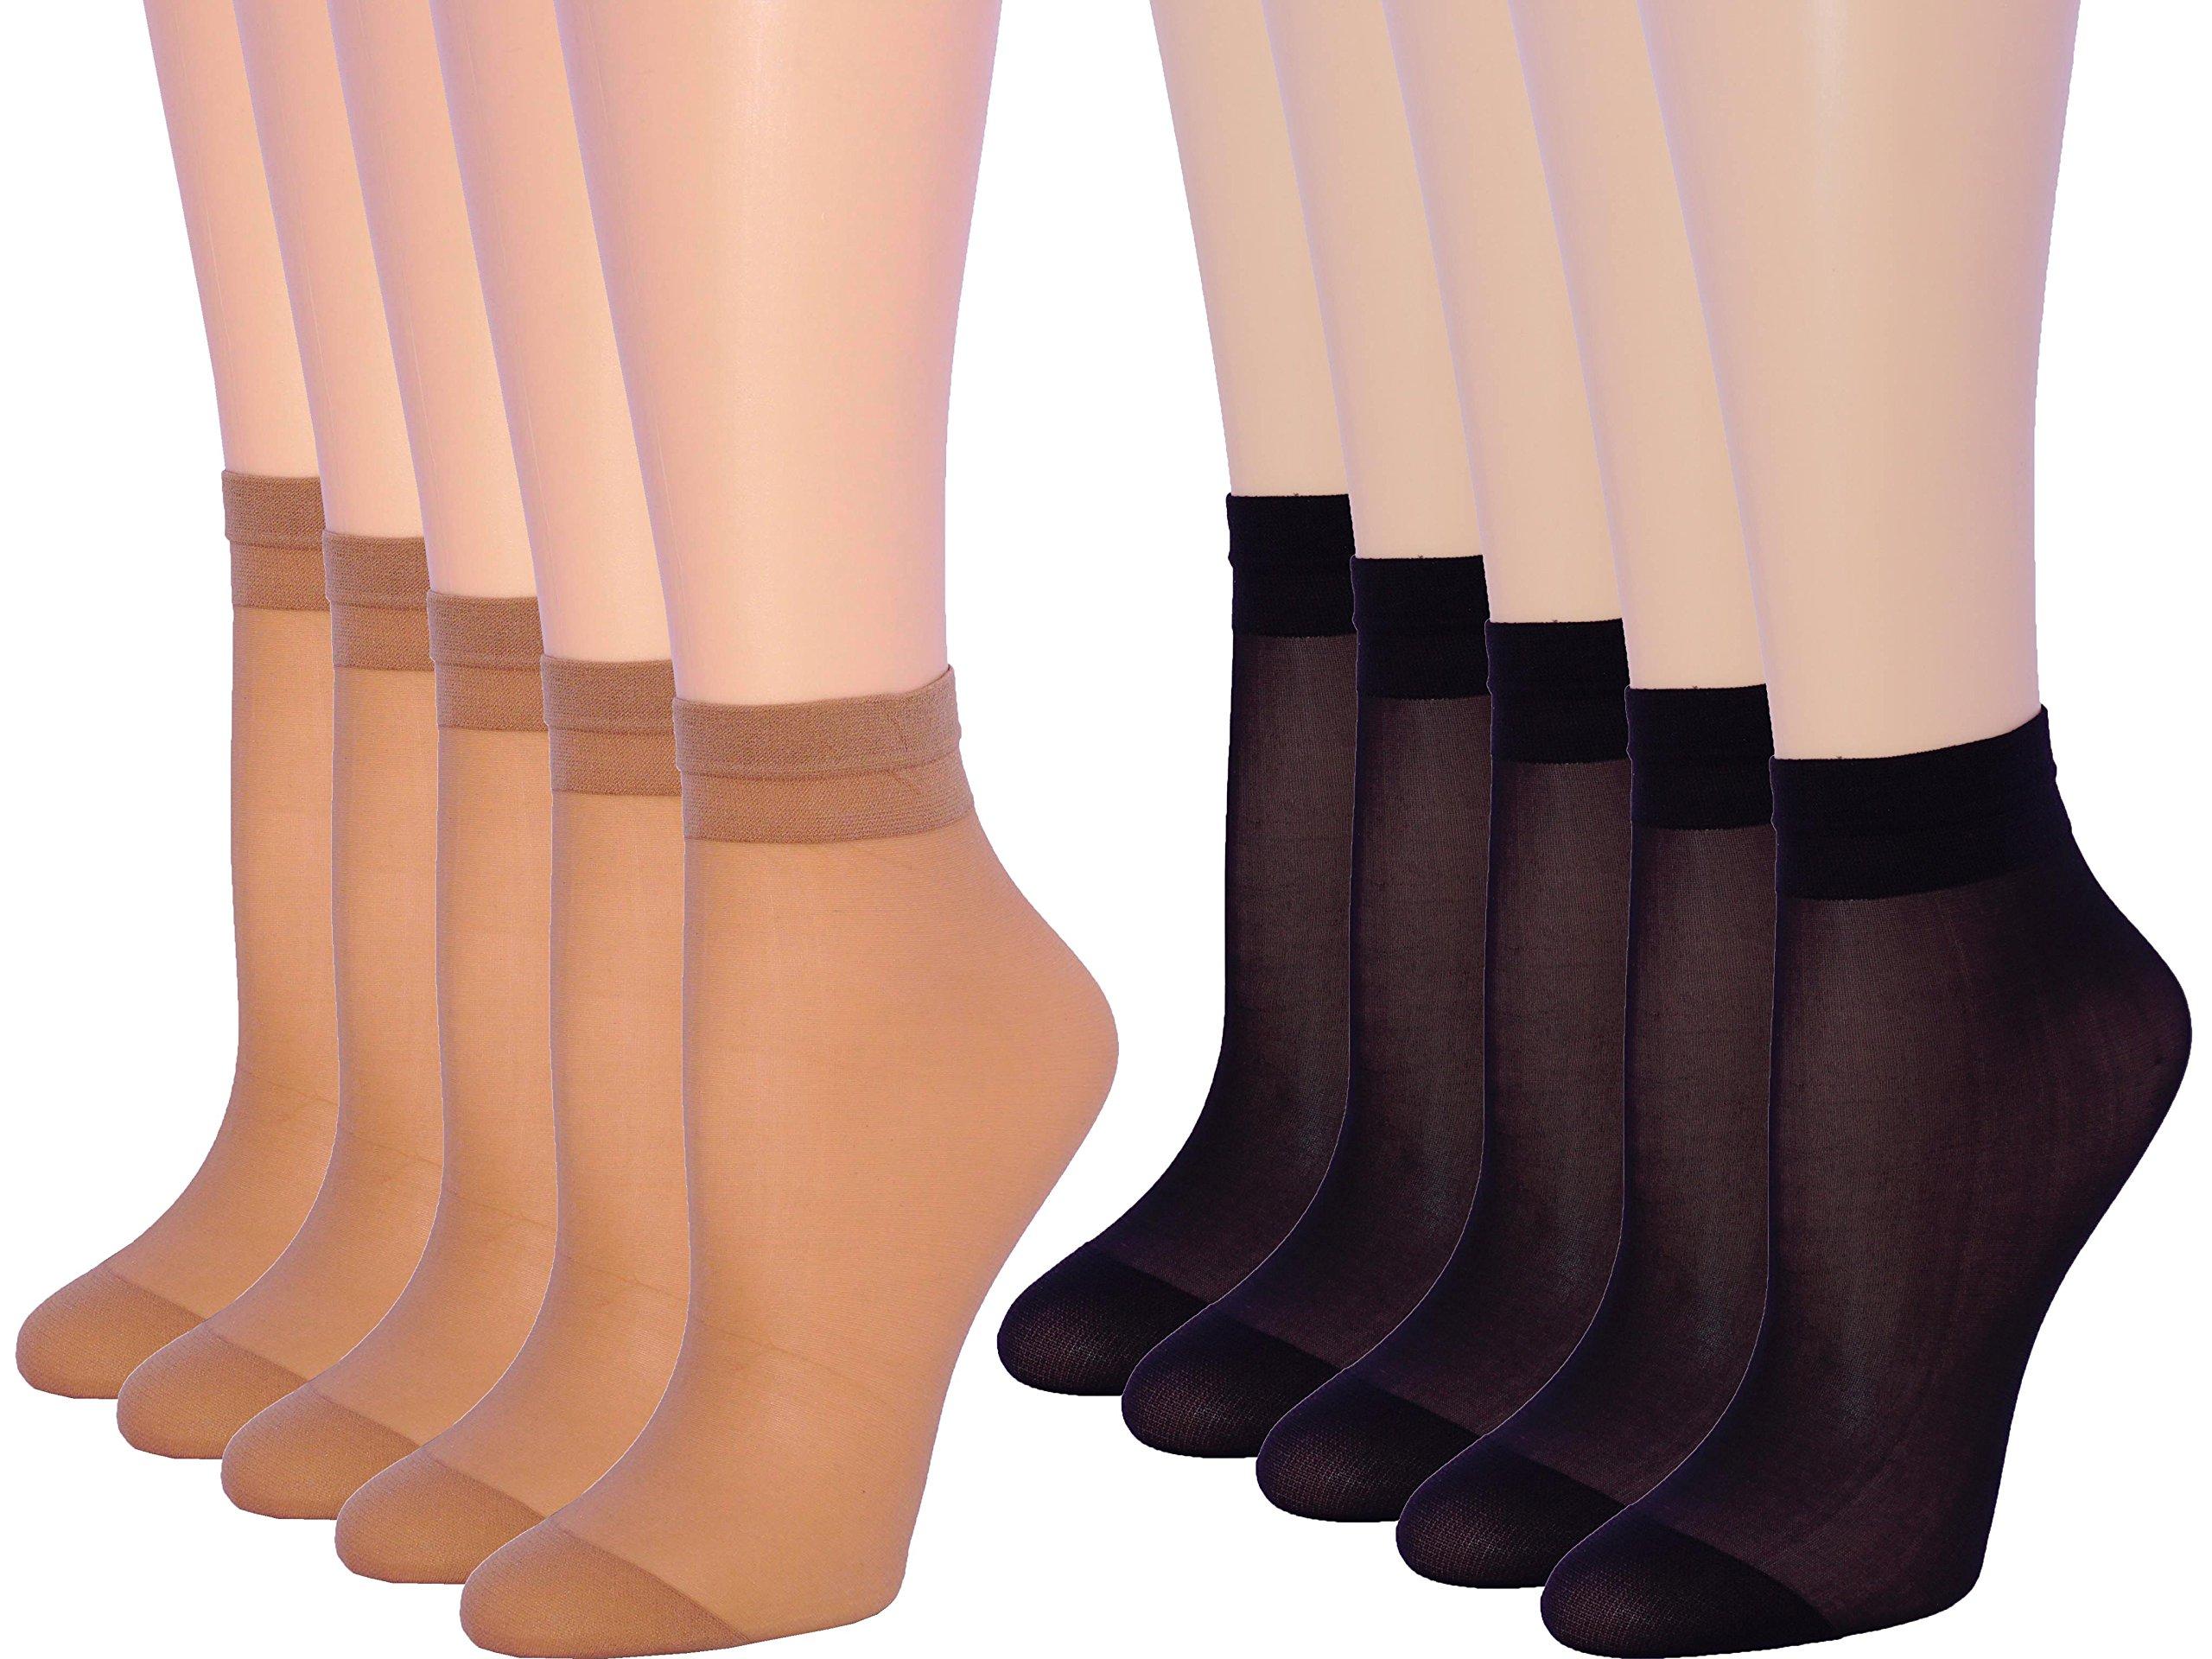 10 Pack Womens Ankle High Sheer Socks 20 DEN (5 pairs Beige and 5 pairs Black)